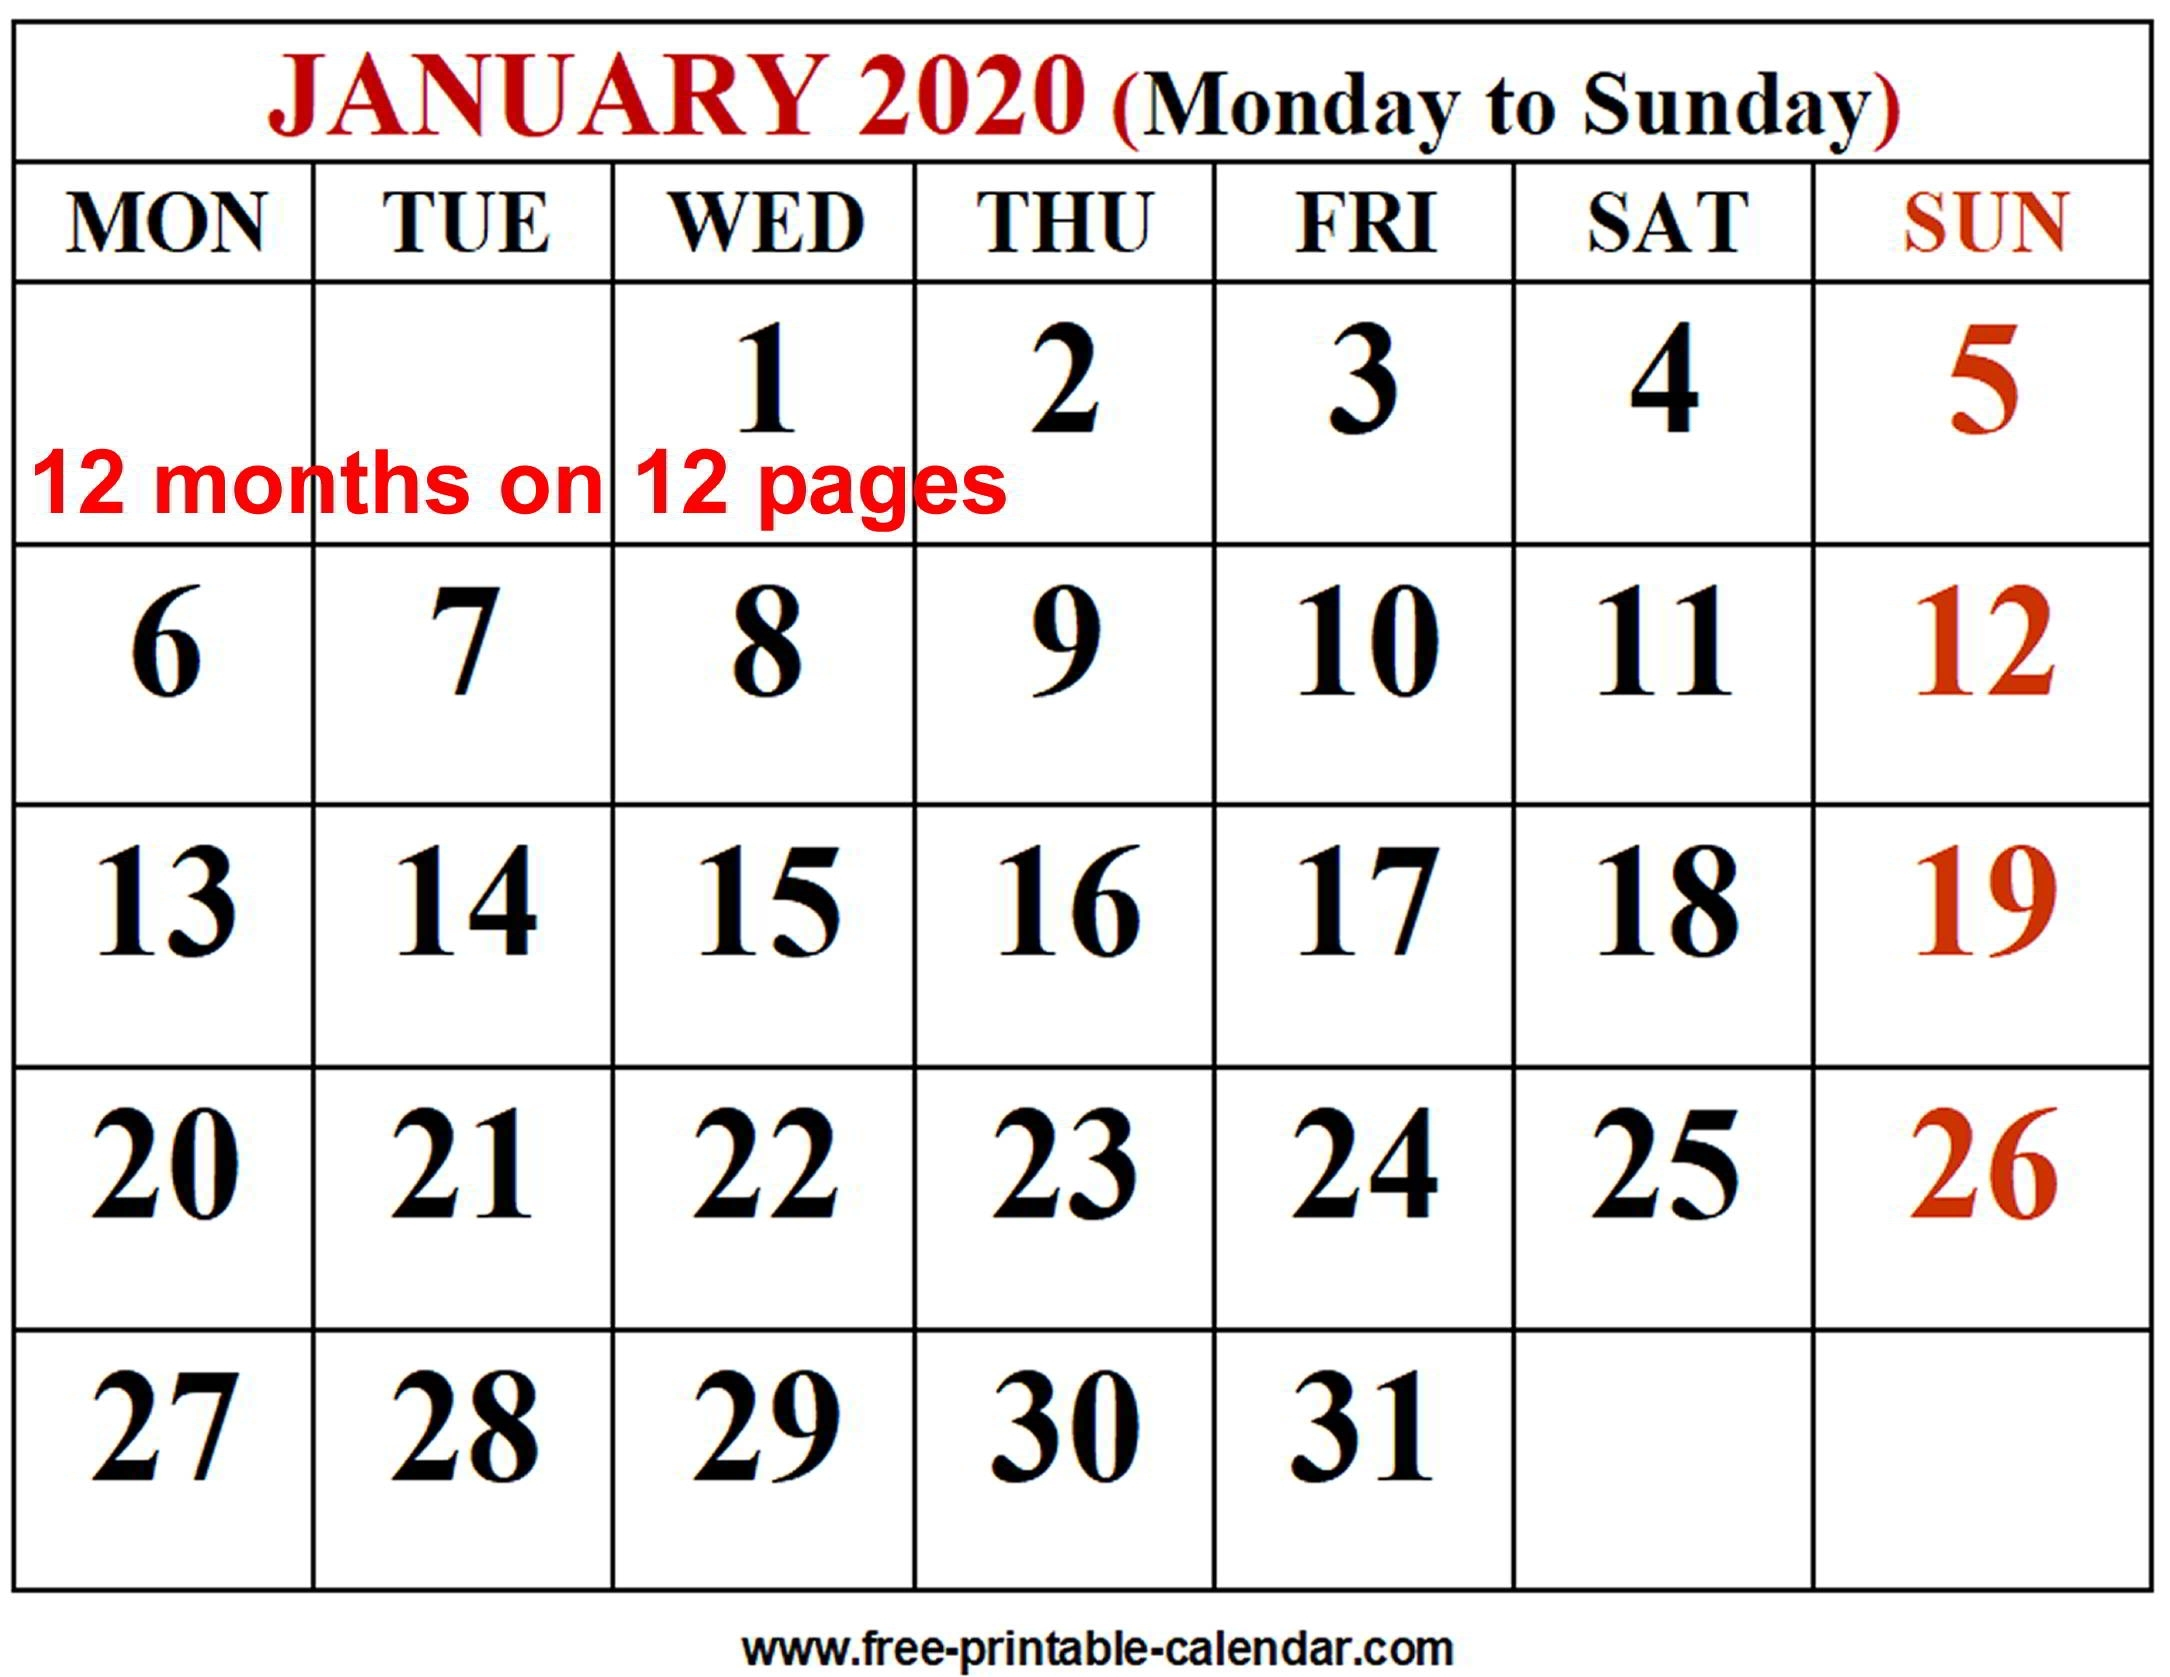 2020 Calendar Template - Free-Printable-Calendar with regard to 2020 Free 12 Month Printable Monthly Calendar